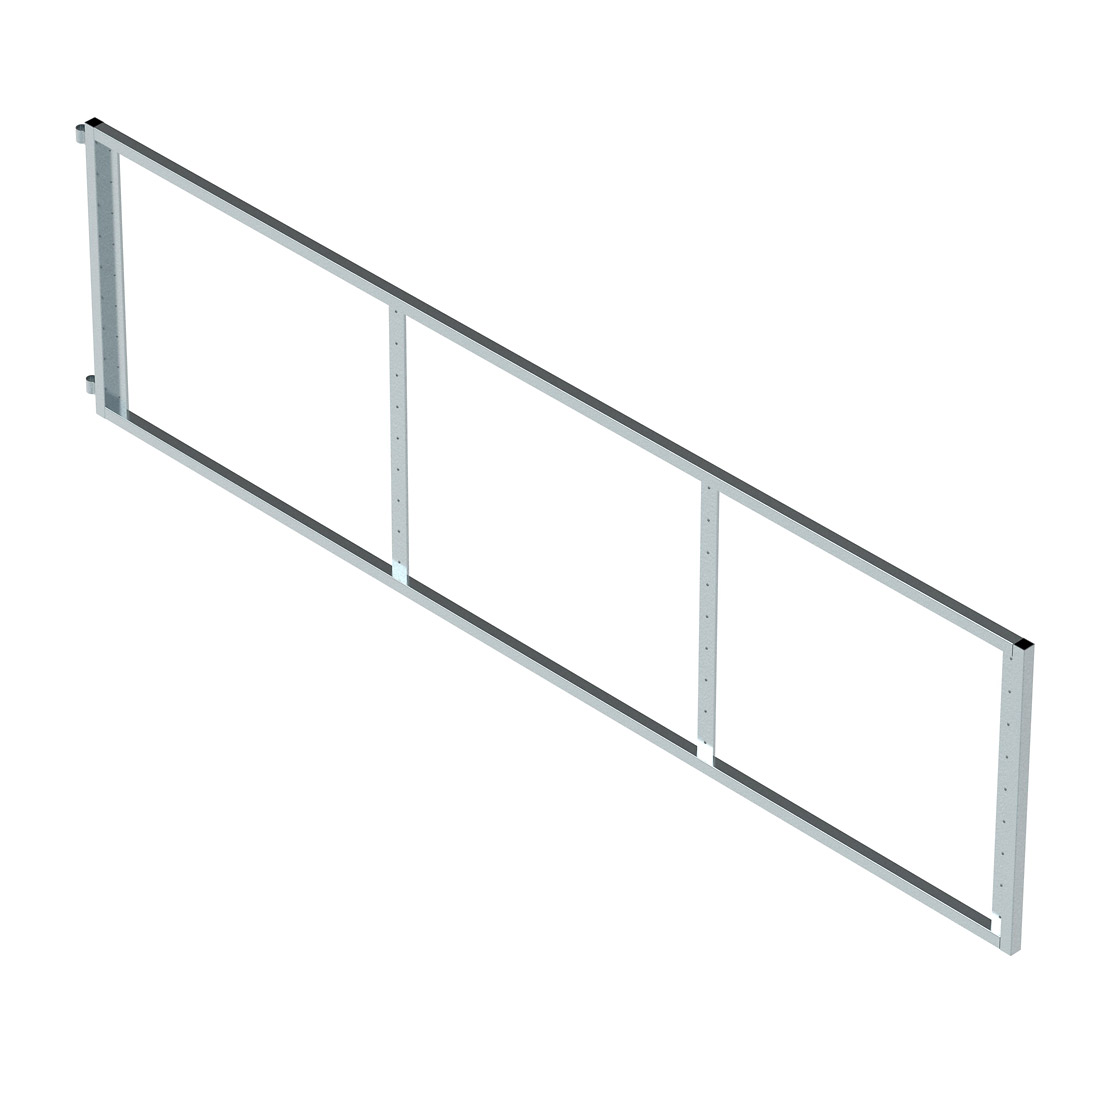 Sheepyard gate 3050mm x 850mm (frame only)